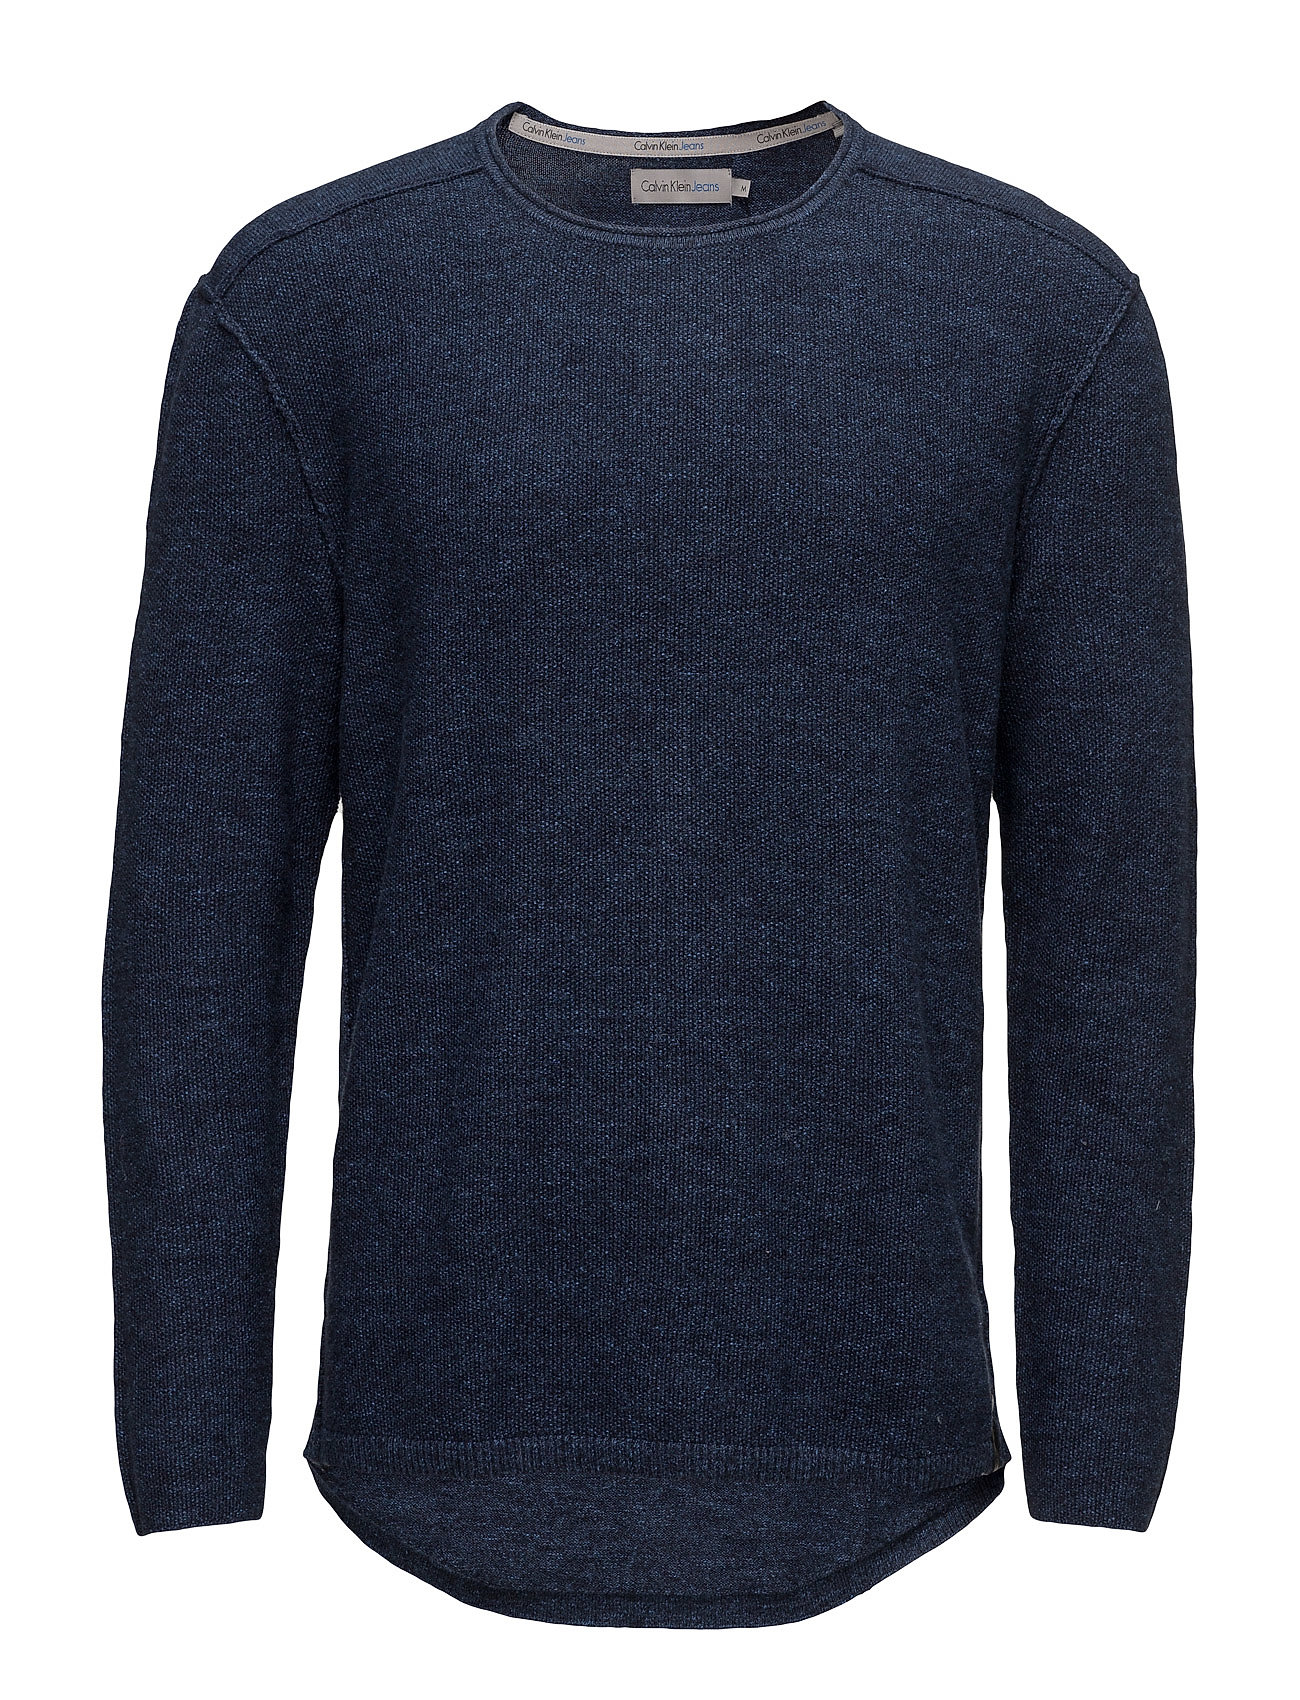 calvin klein jeans Saxo cn sweater ls, fra boozt.com dk